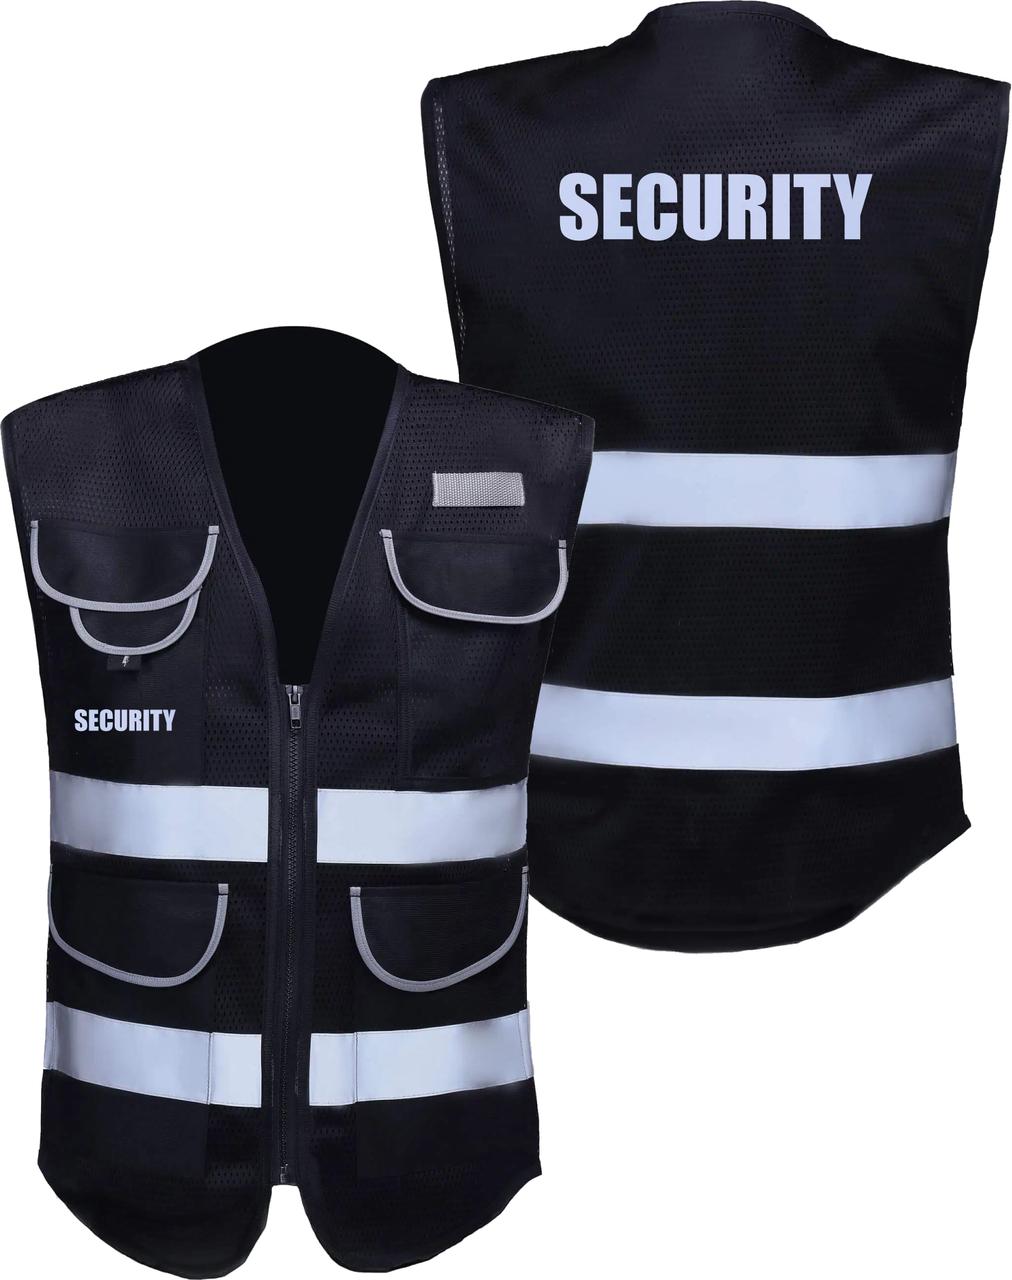 Black Security Vest Non ANSI  | Security Guard Event Staff Reflective Vest  | Safety Vest with Pockets